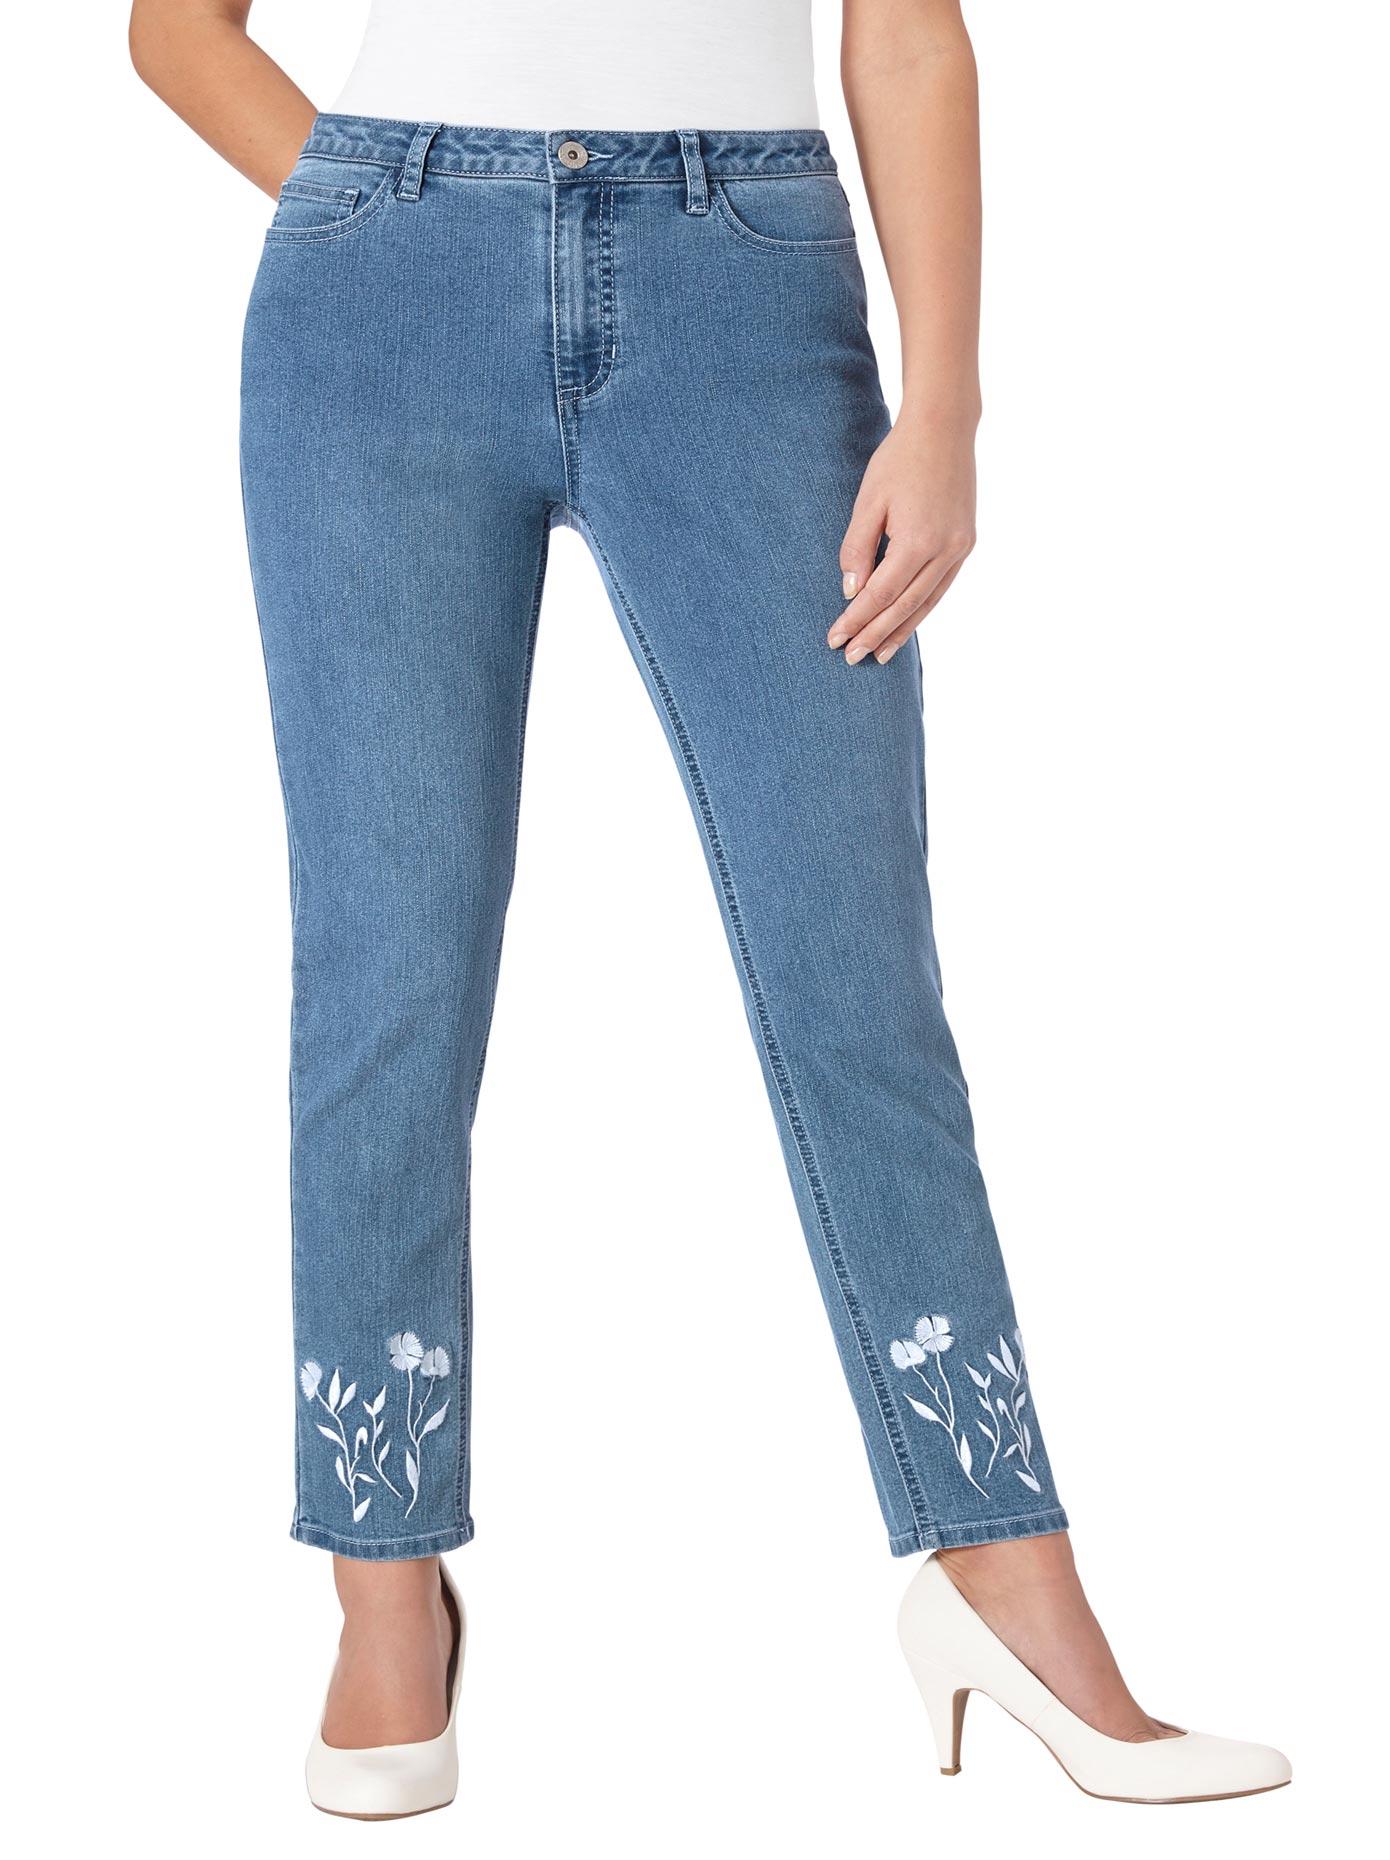 Image of Alessa W. 5-Pocket-Jeans